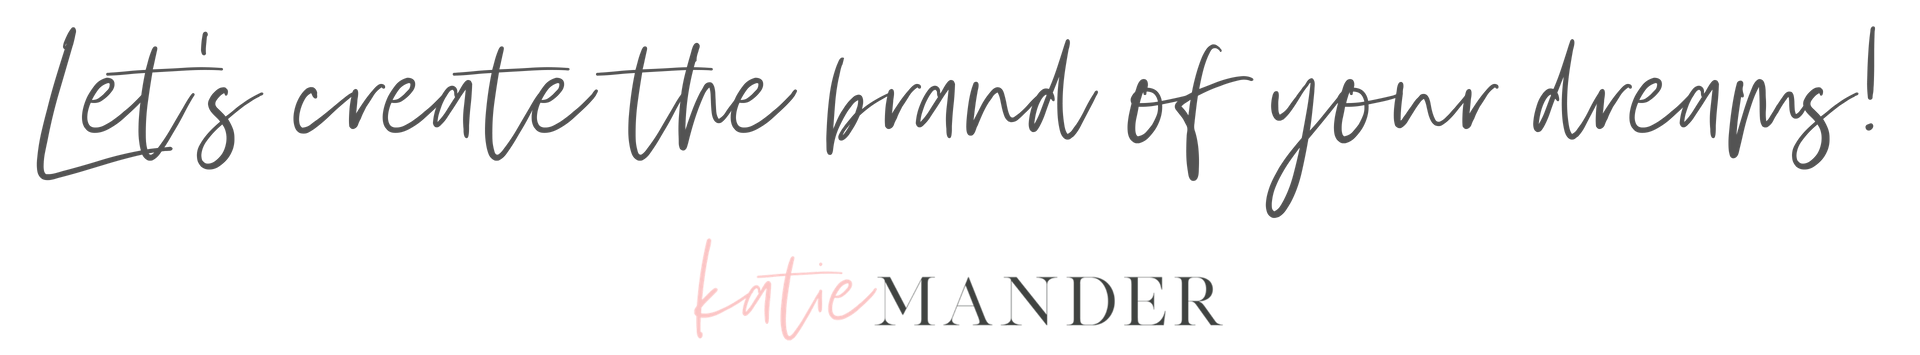 katie mander girlcrush collective branding service